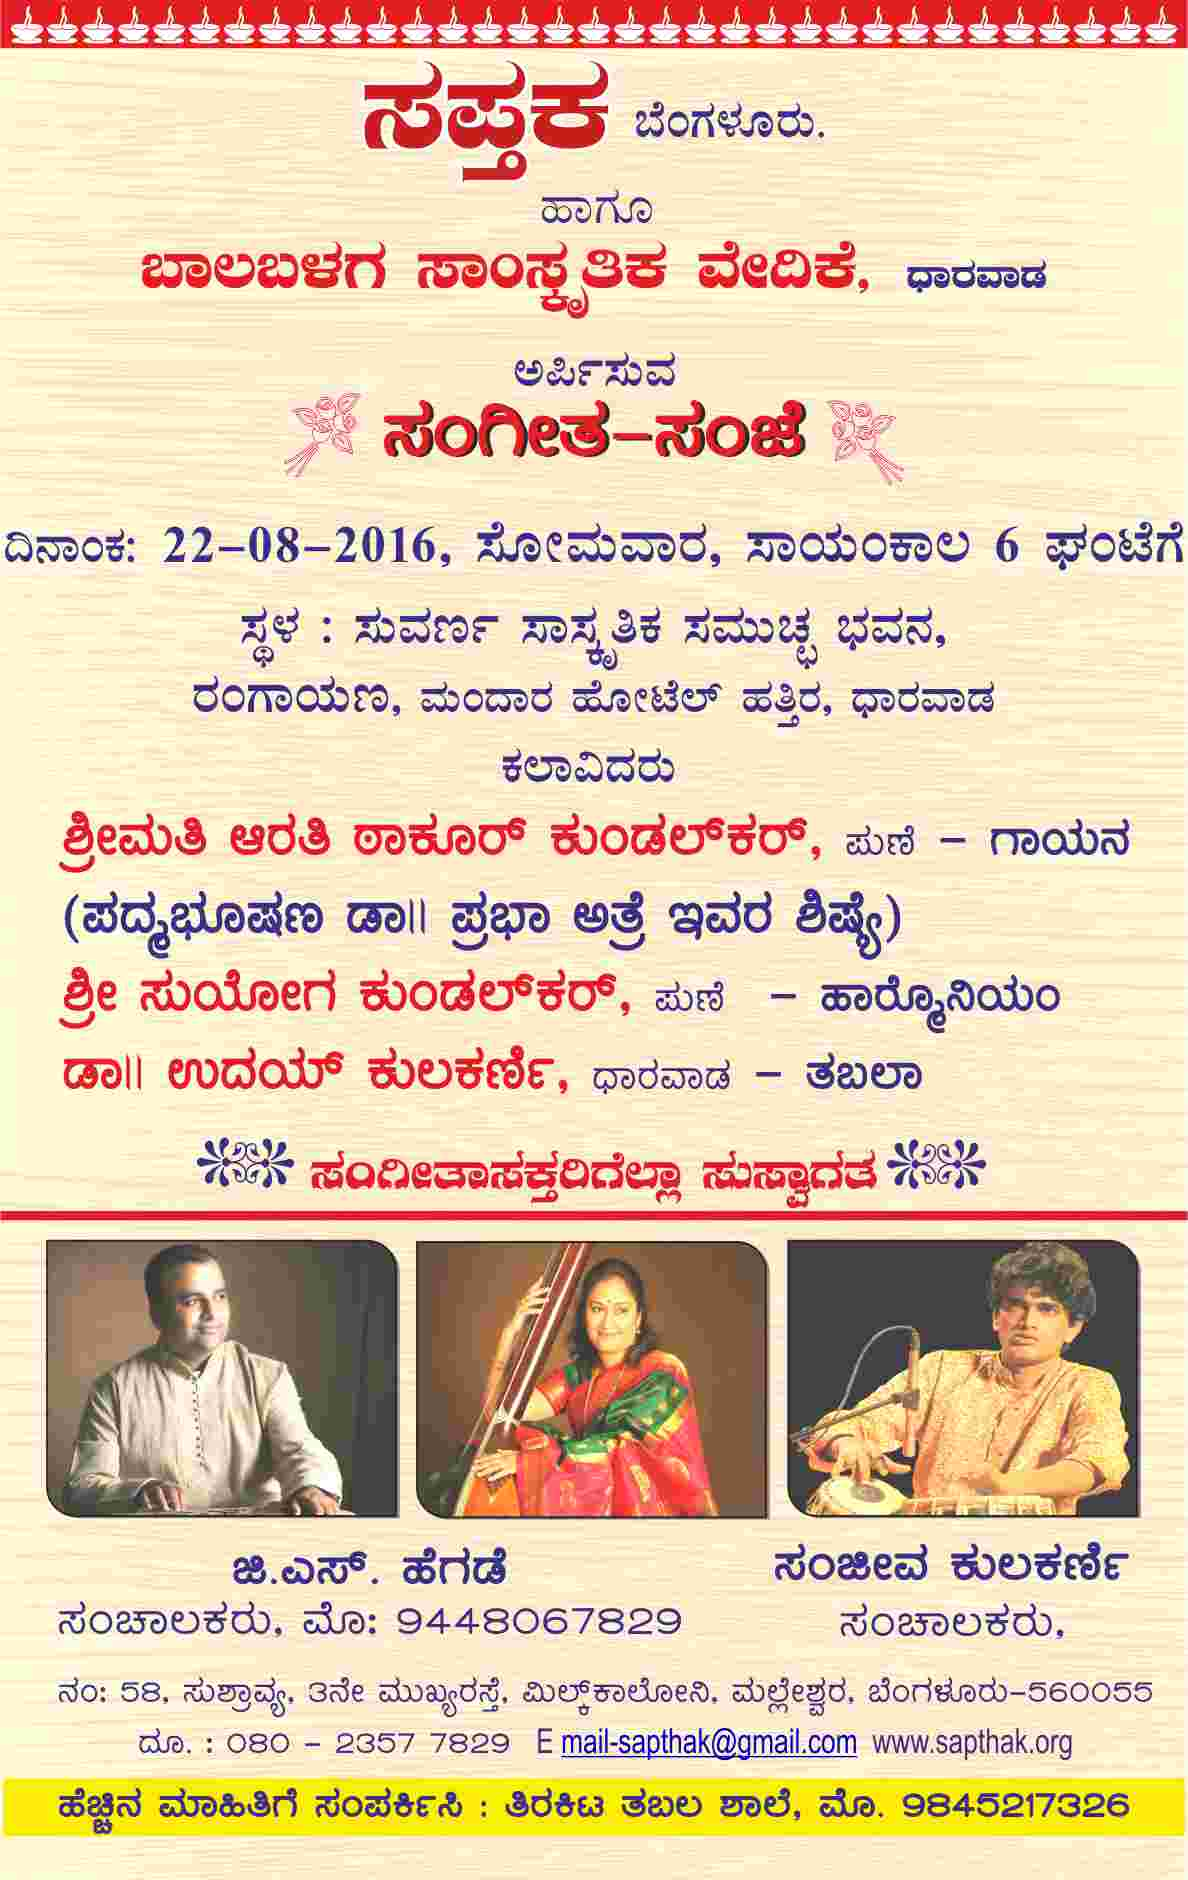 Sangeetha Sanje Dharwada Kannada 16